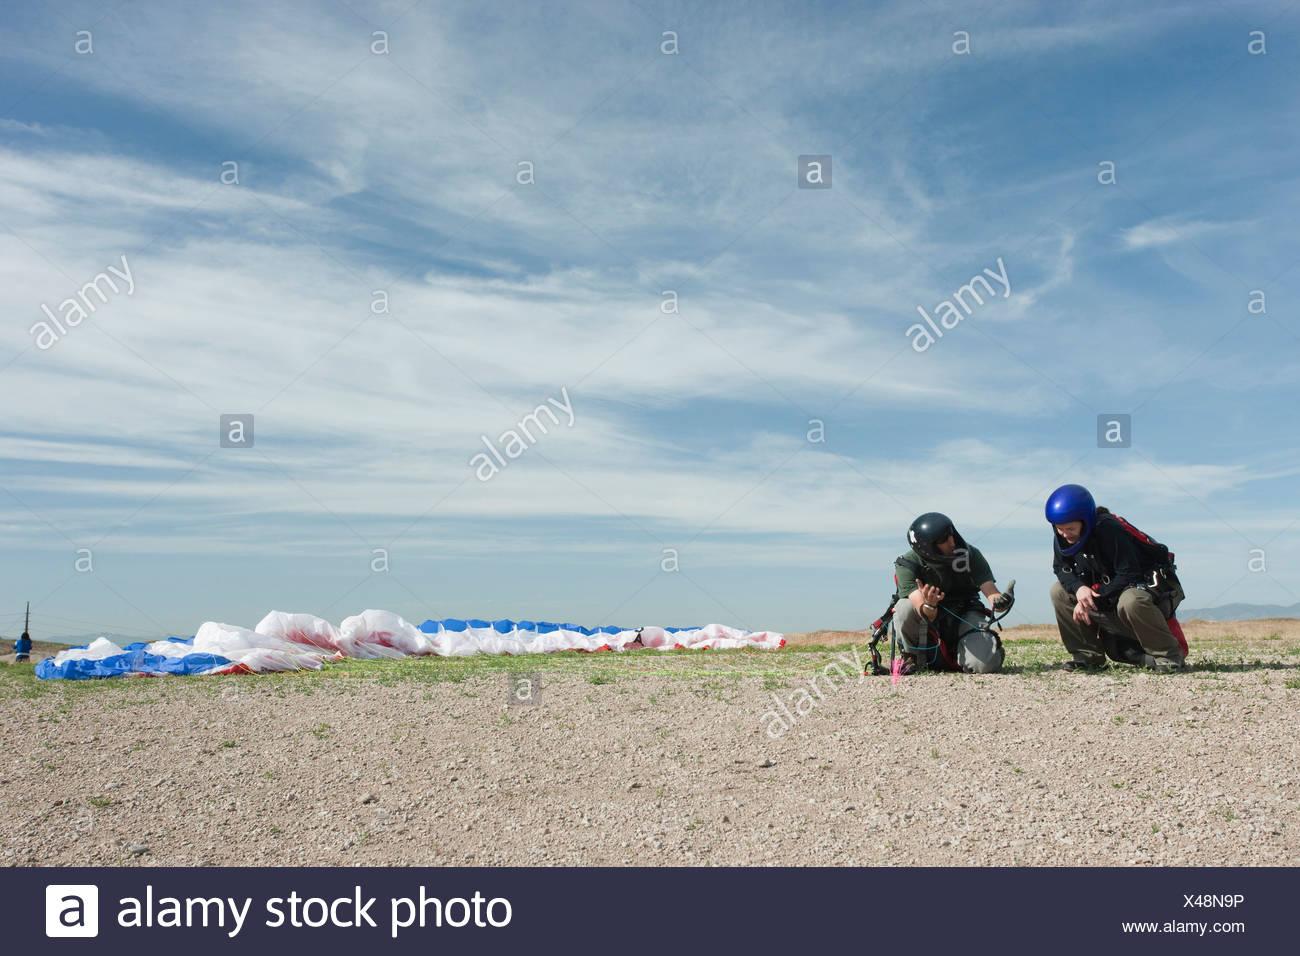 USA, Utah, Lehi, Two paragliders on ground - Stock Image